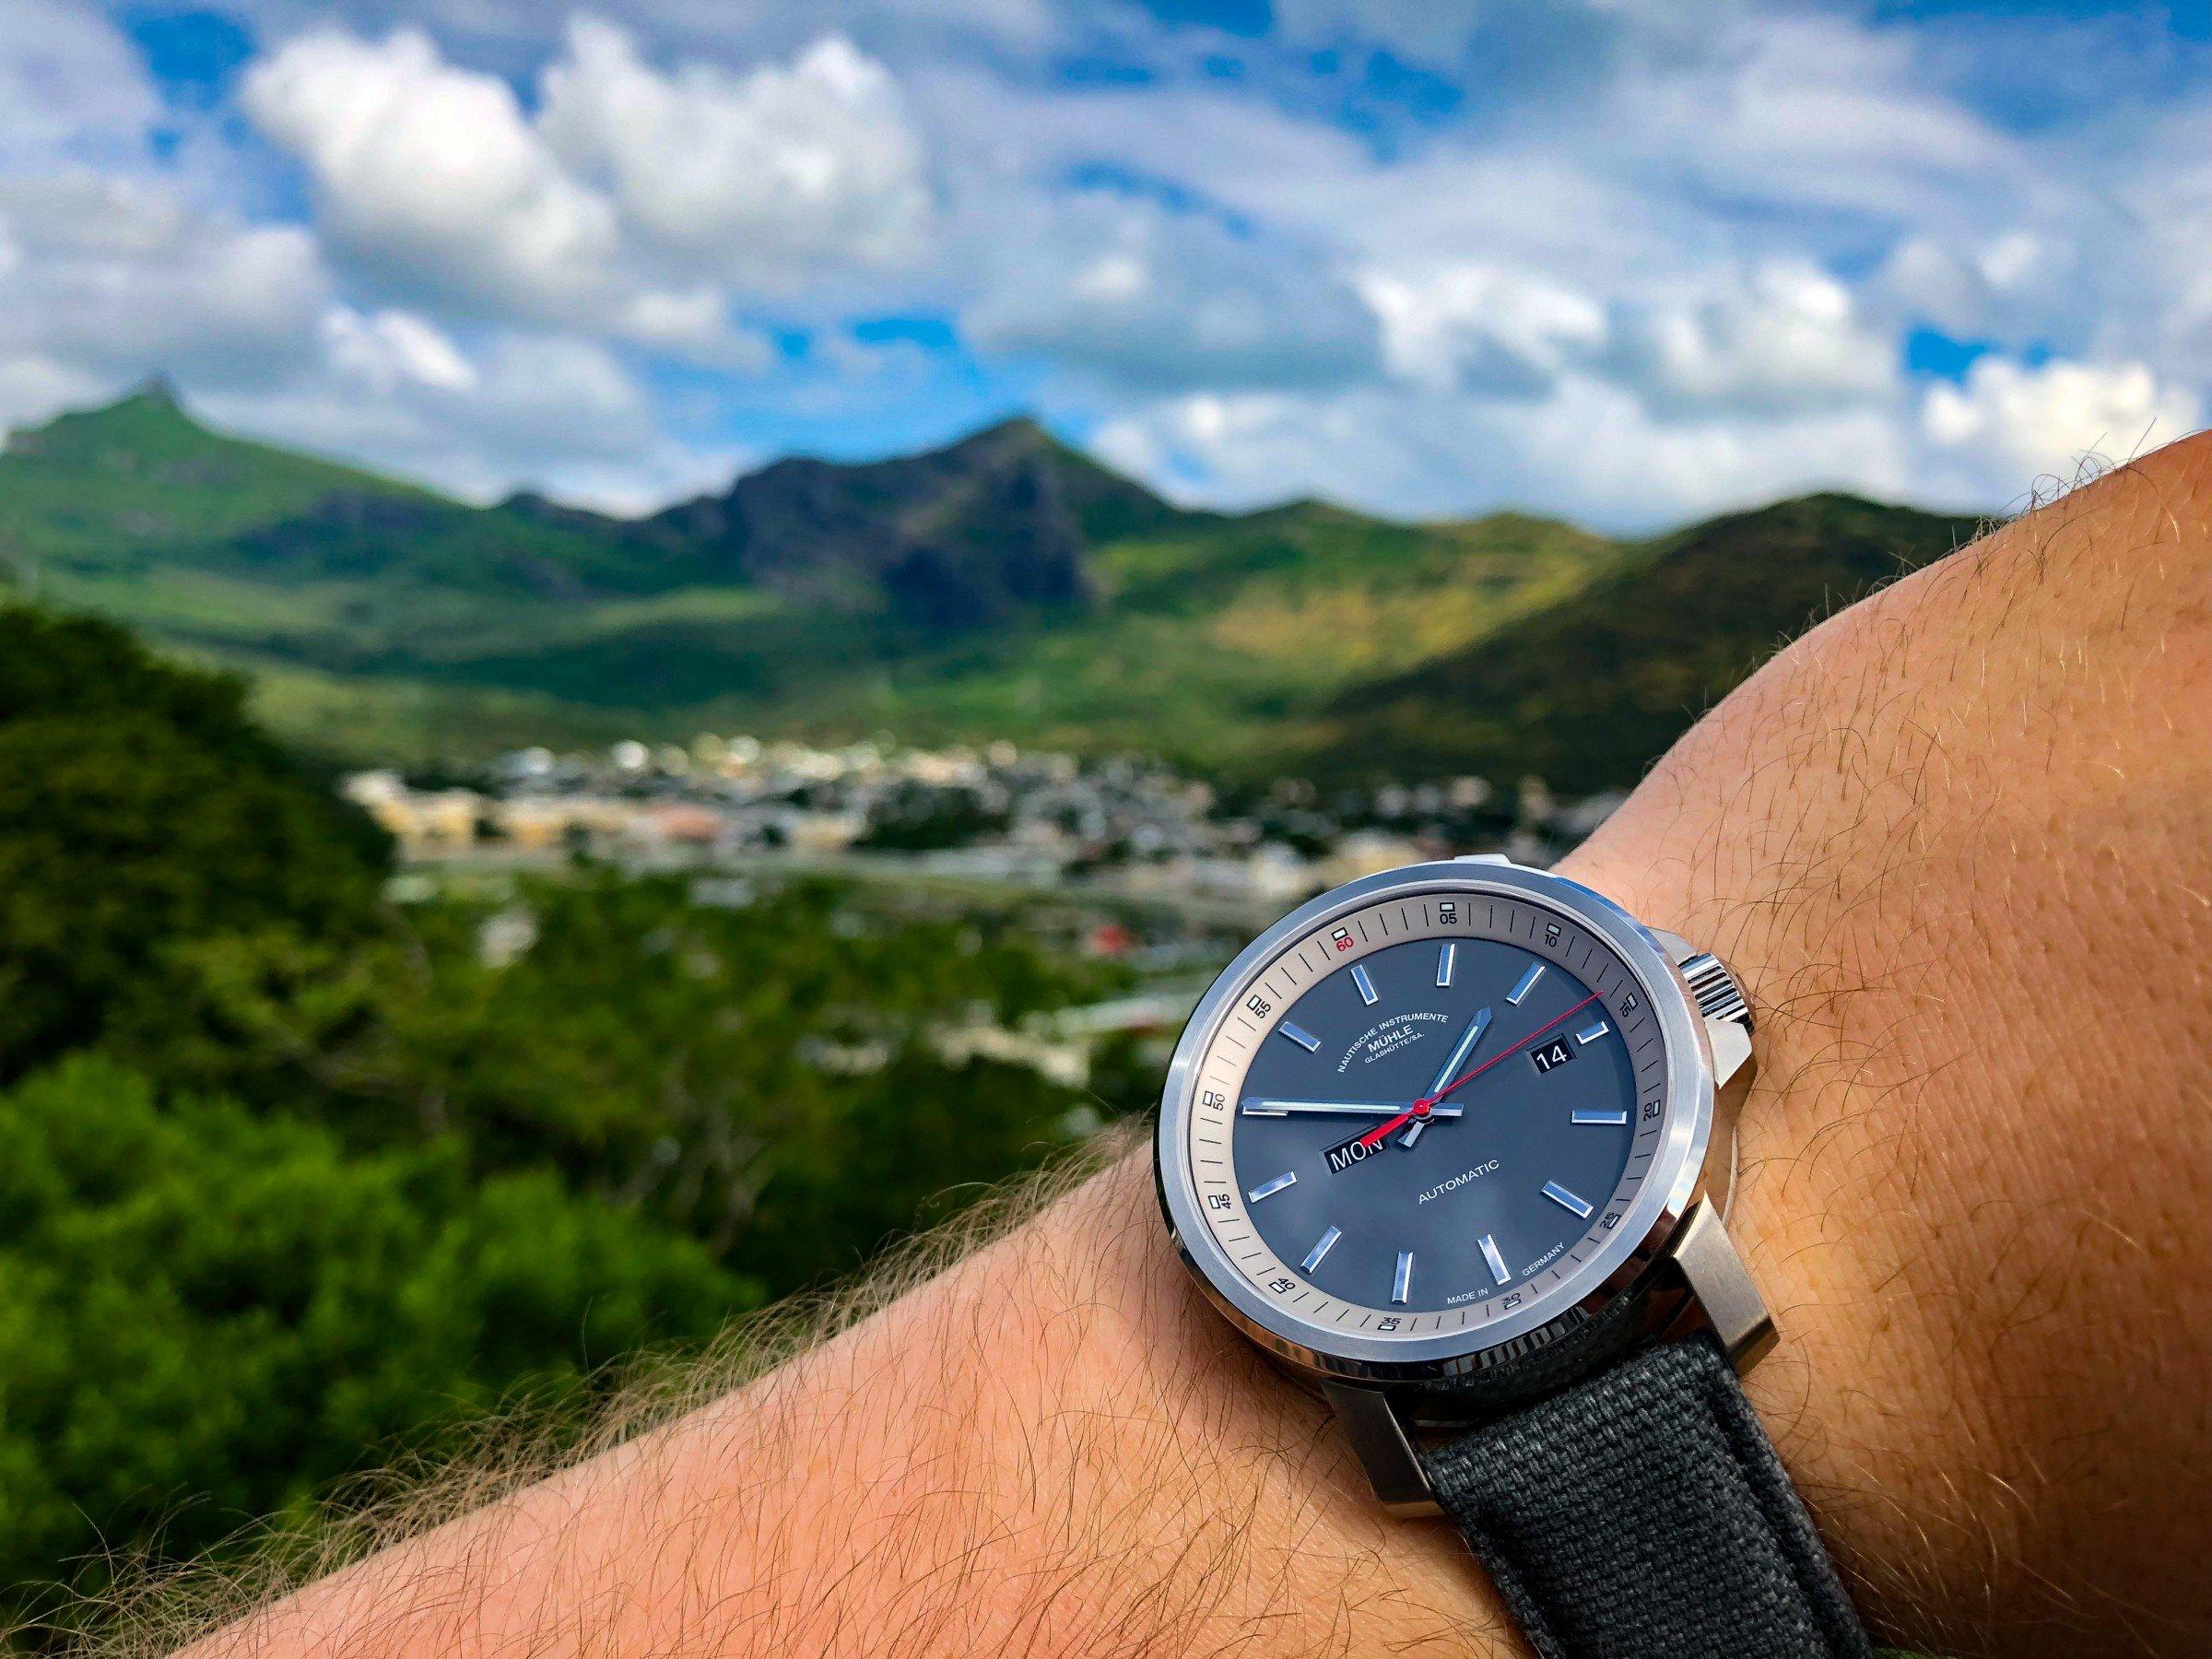 Mühle-Glashütte 29er Tag-Datum 2018 Gebirge Mauritius